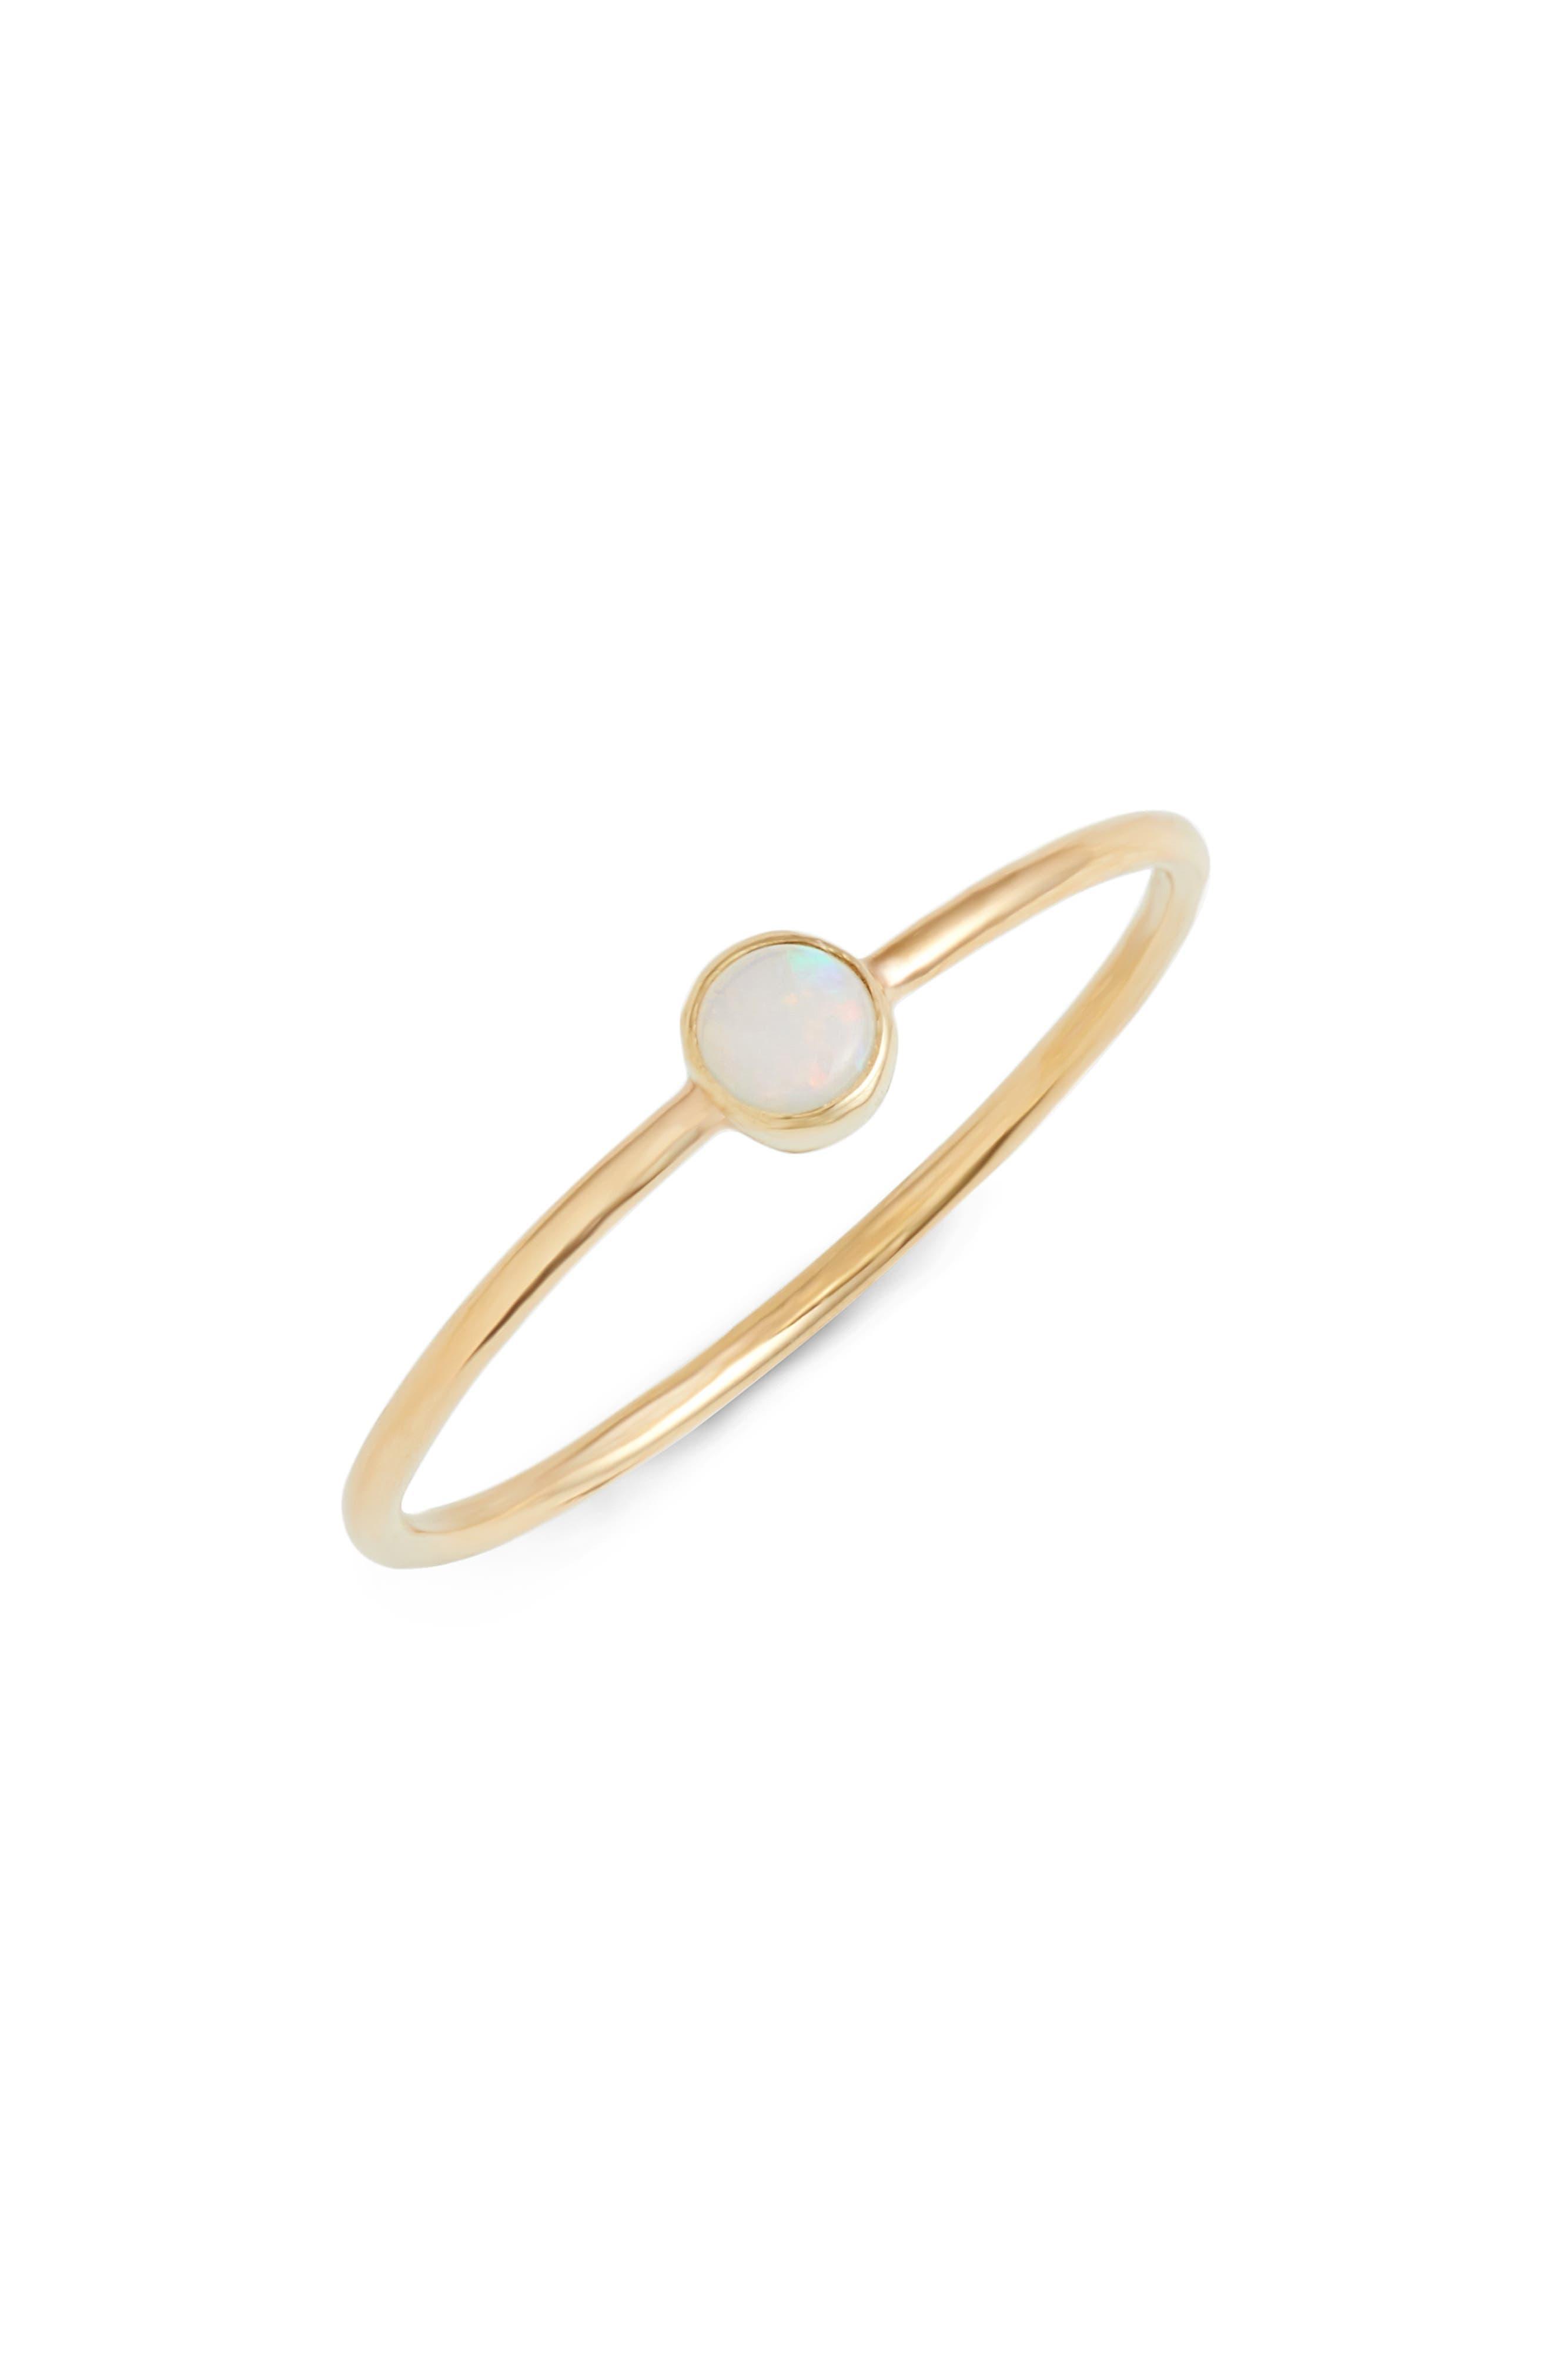 Opal Stacking Ring,                             Main thumbnail 1, color,                             YELLOW GOLD/ OPAL